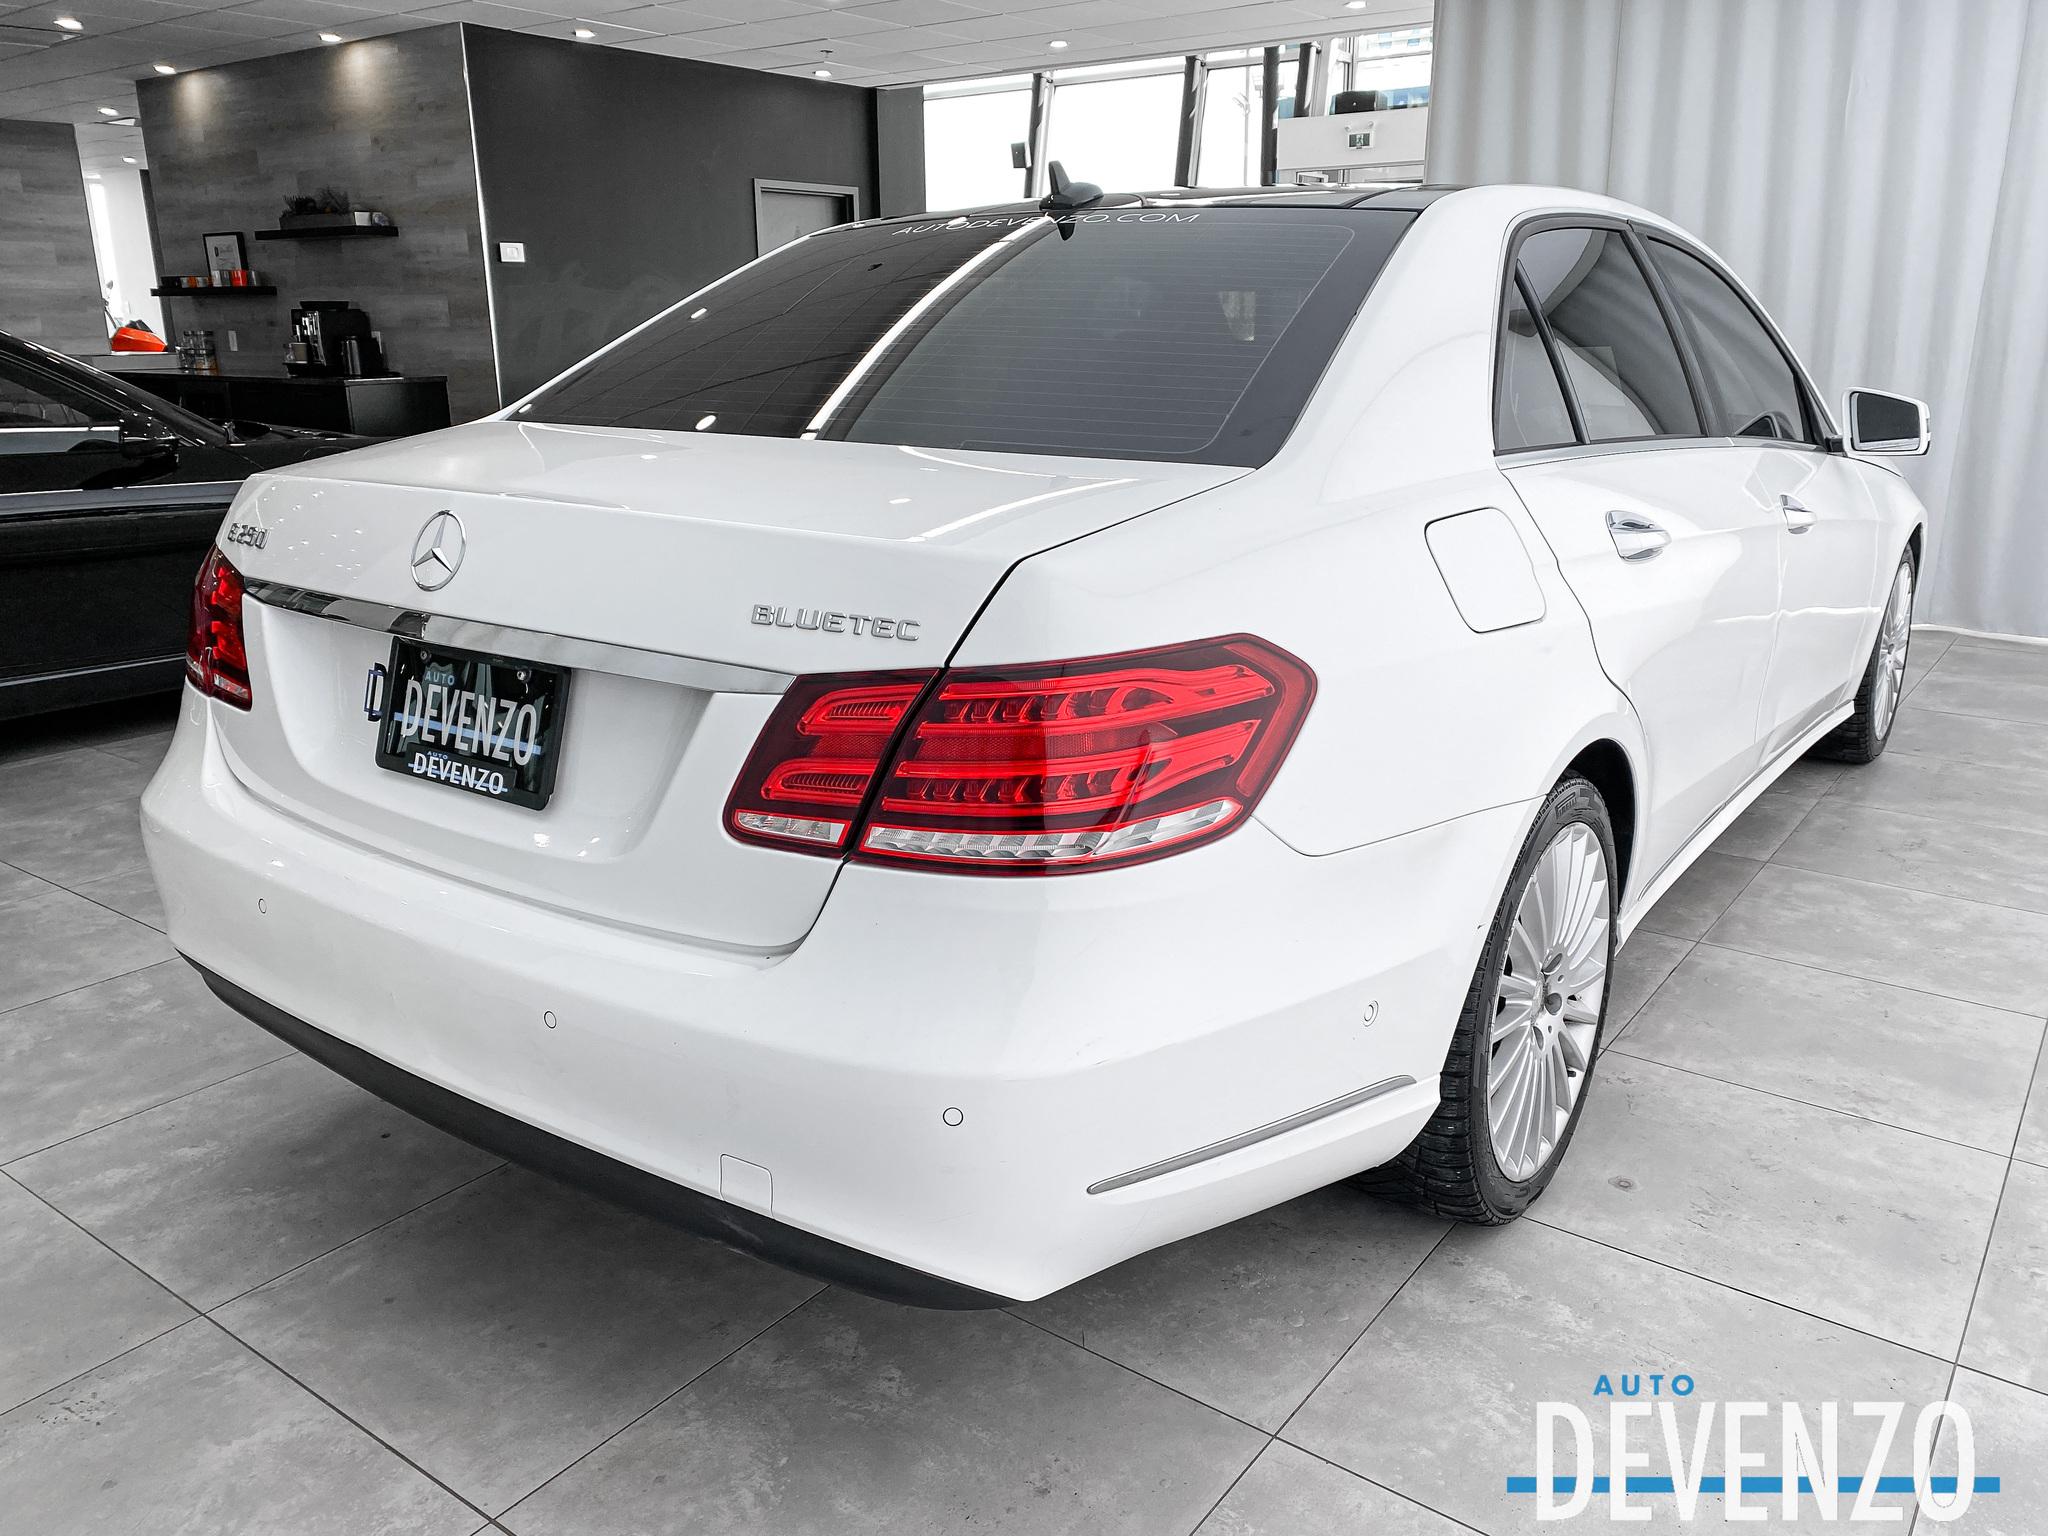 2014 Mercedes-Benz E-Class E250 BlueTEC 4MATIC Diesel  Navi / Camera 360 complet